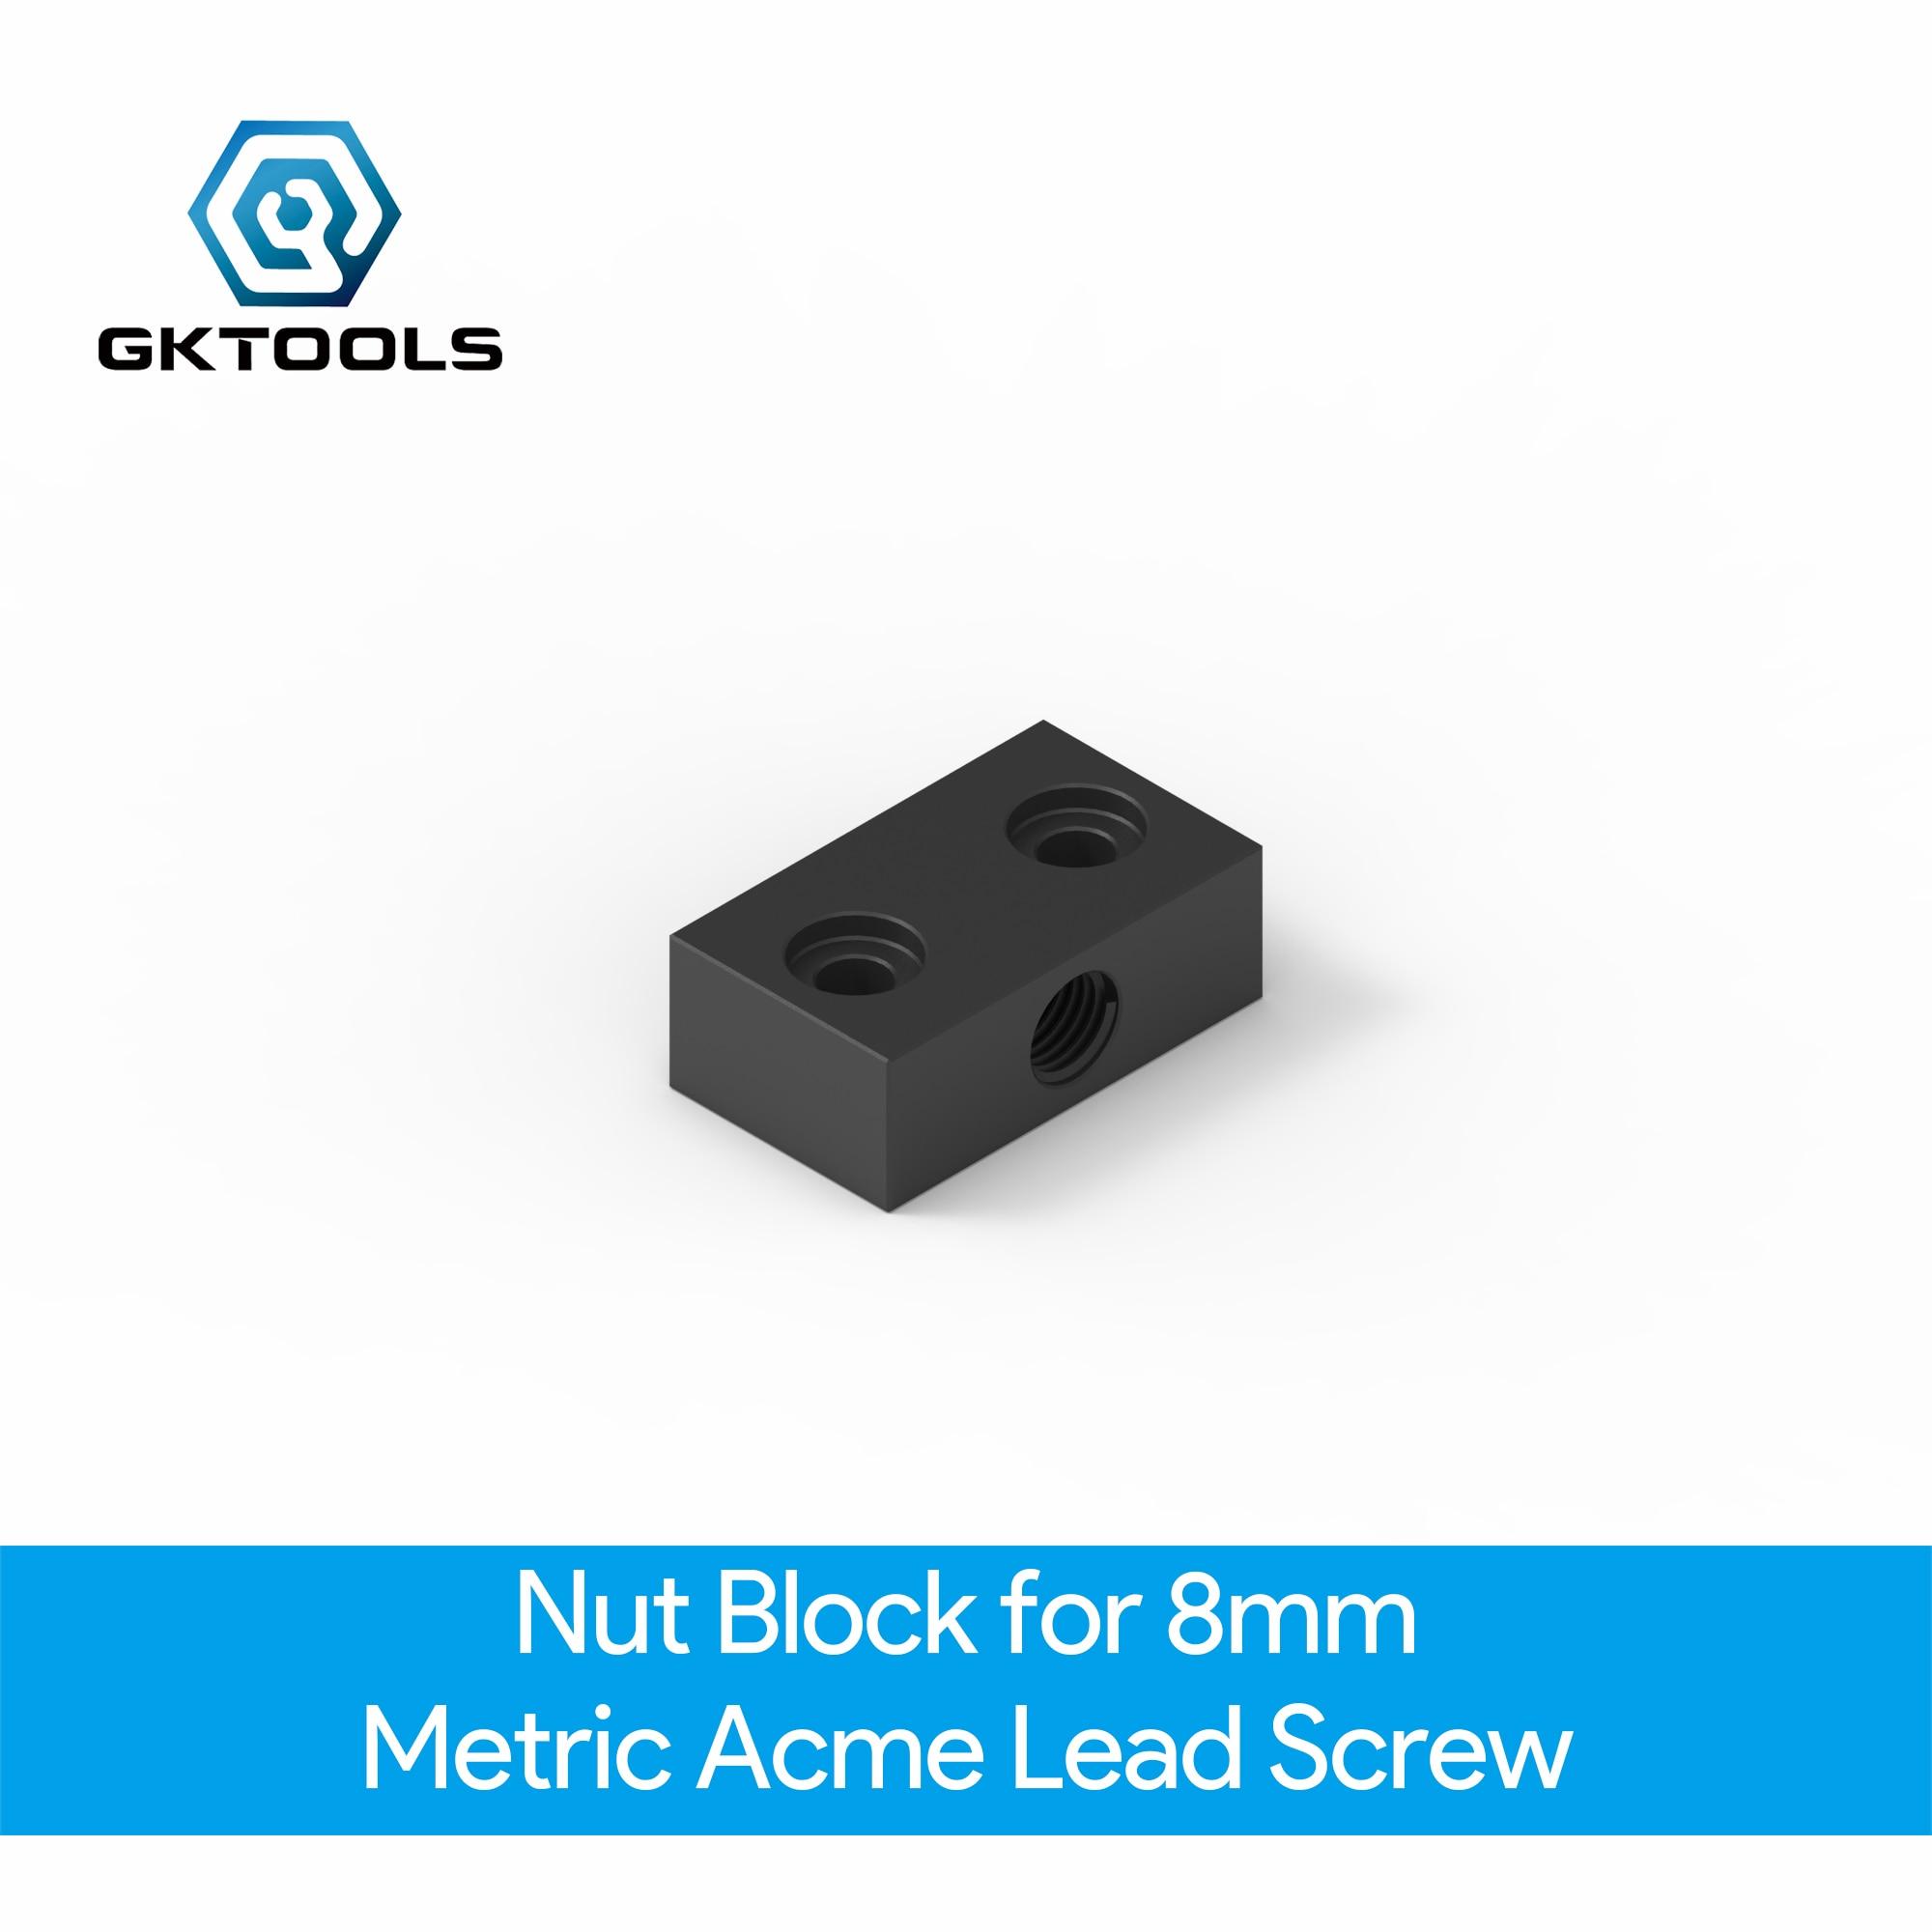 OpenBuilds Nut Block For 8mm Metric Acme Lead Screw